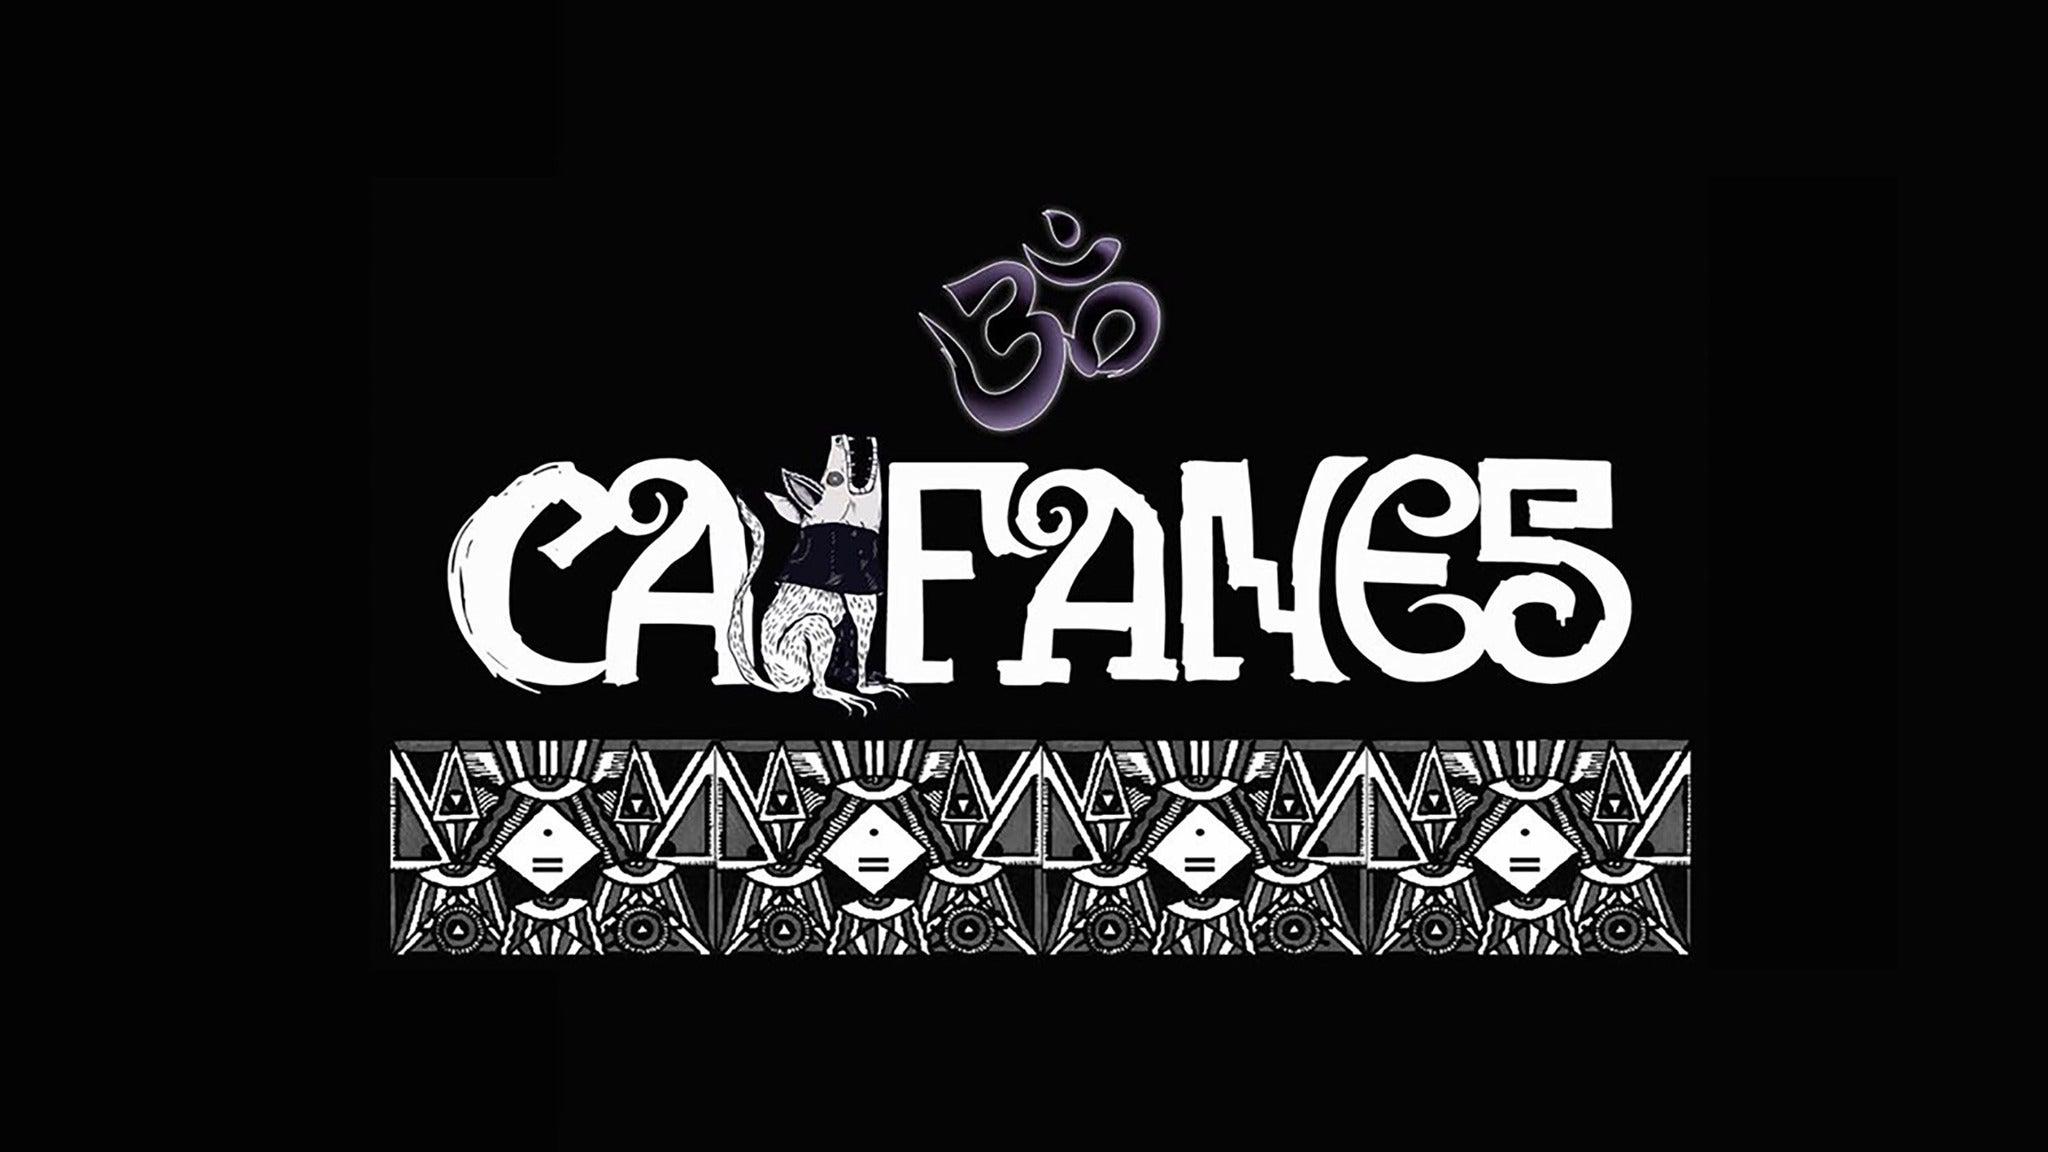 Caifanes presale password for early tickets in El Paso